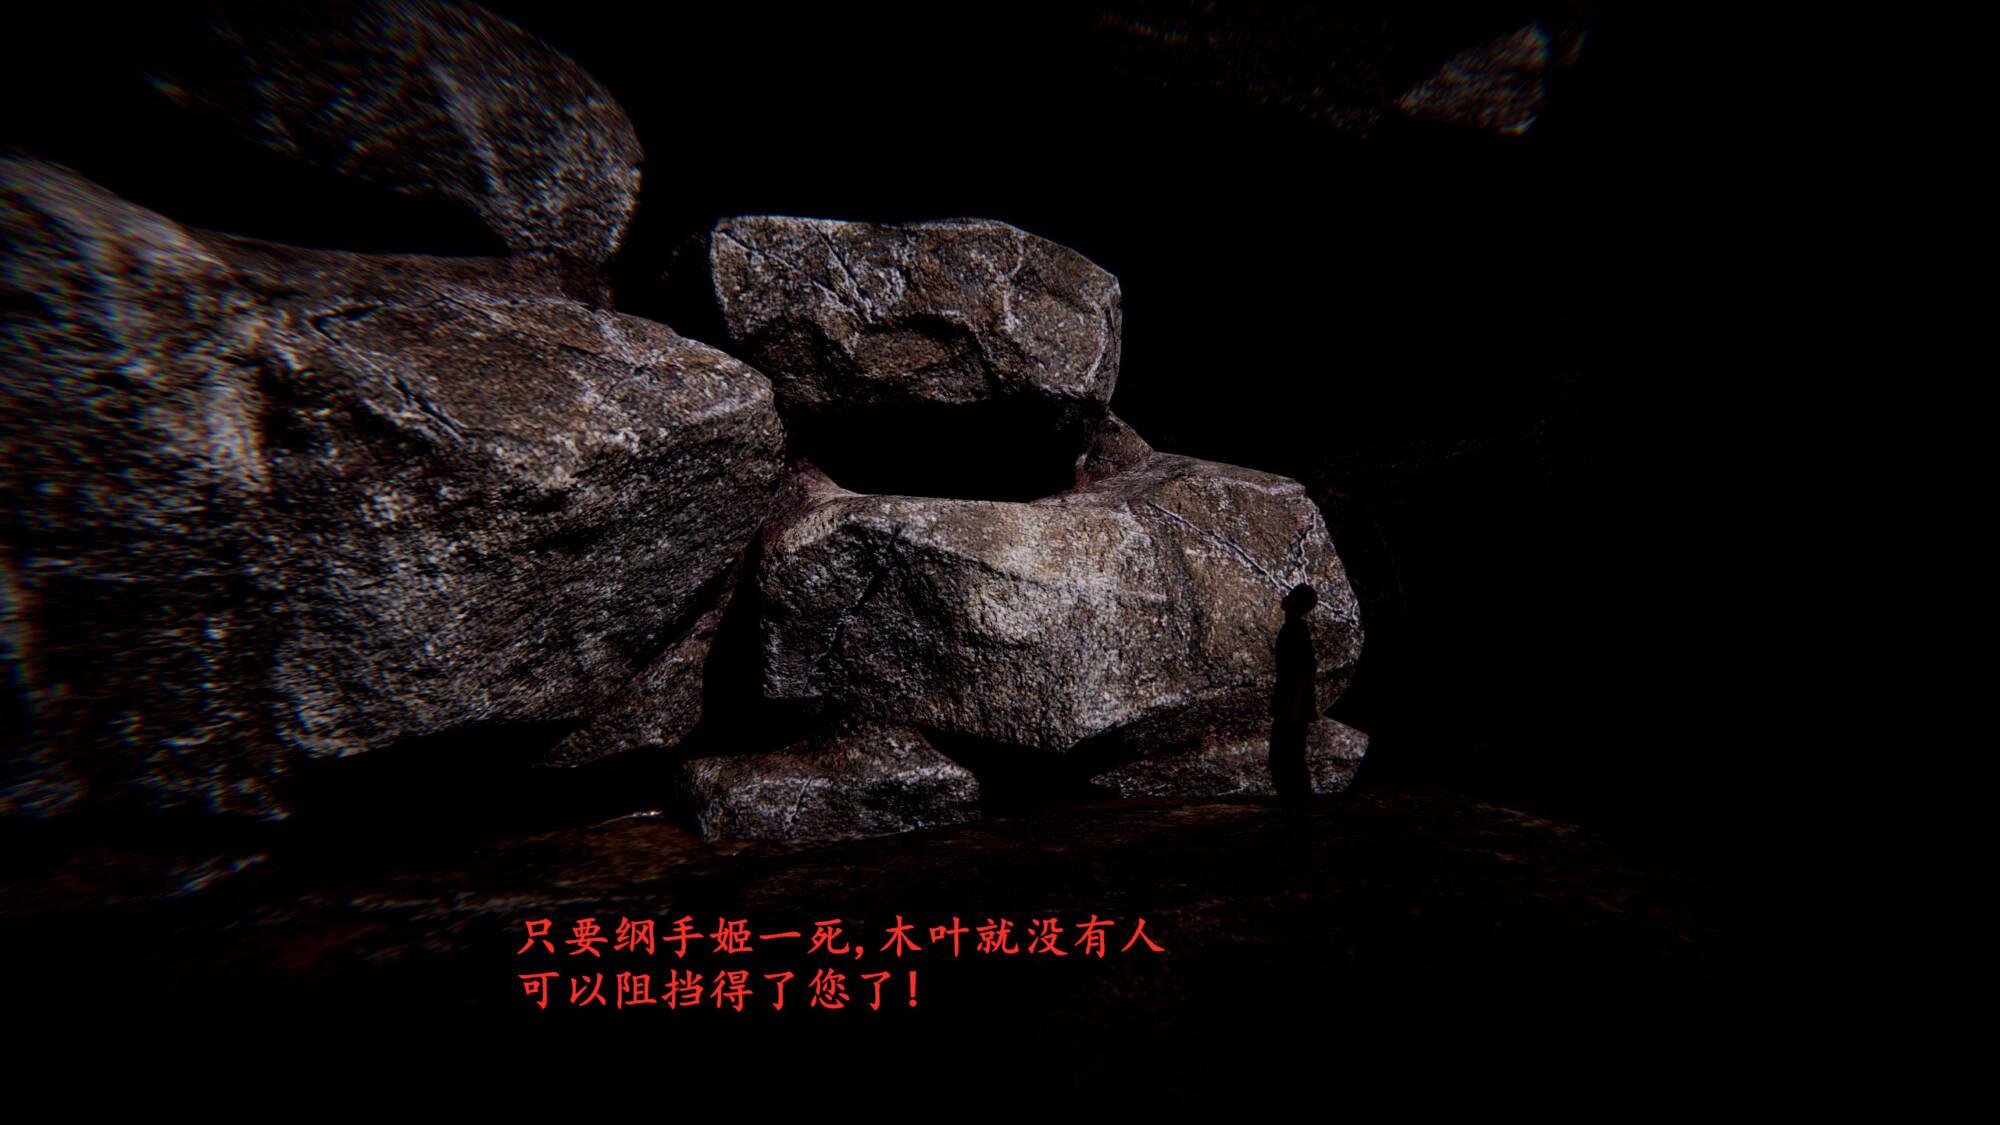 漫游狂想曲 - 6 纲手最期 (Chinese) - page006 Naruto,  xxx porn rule34